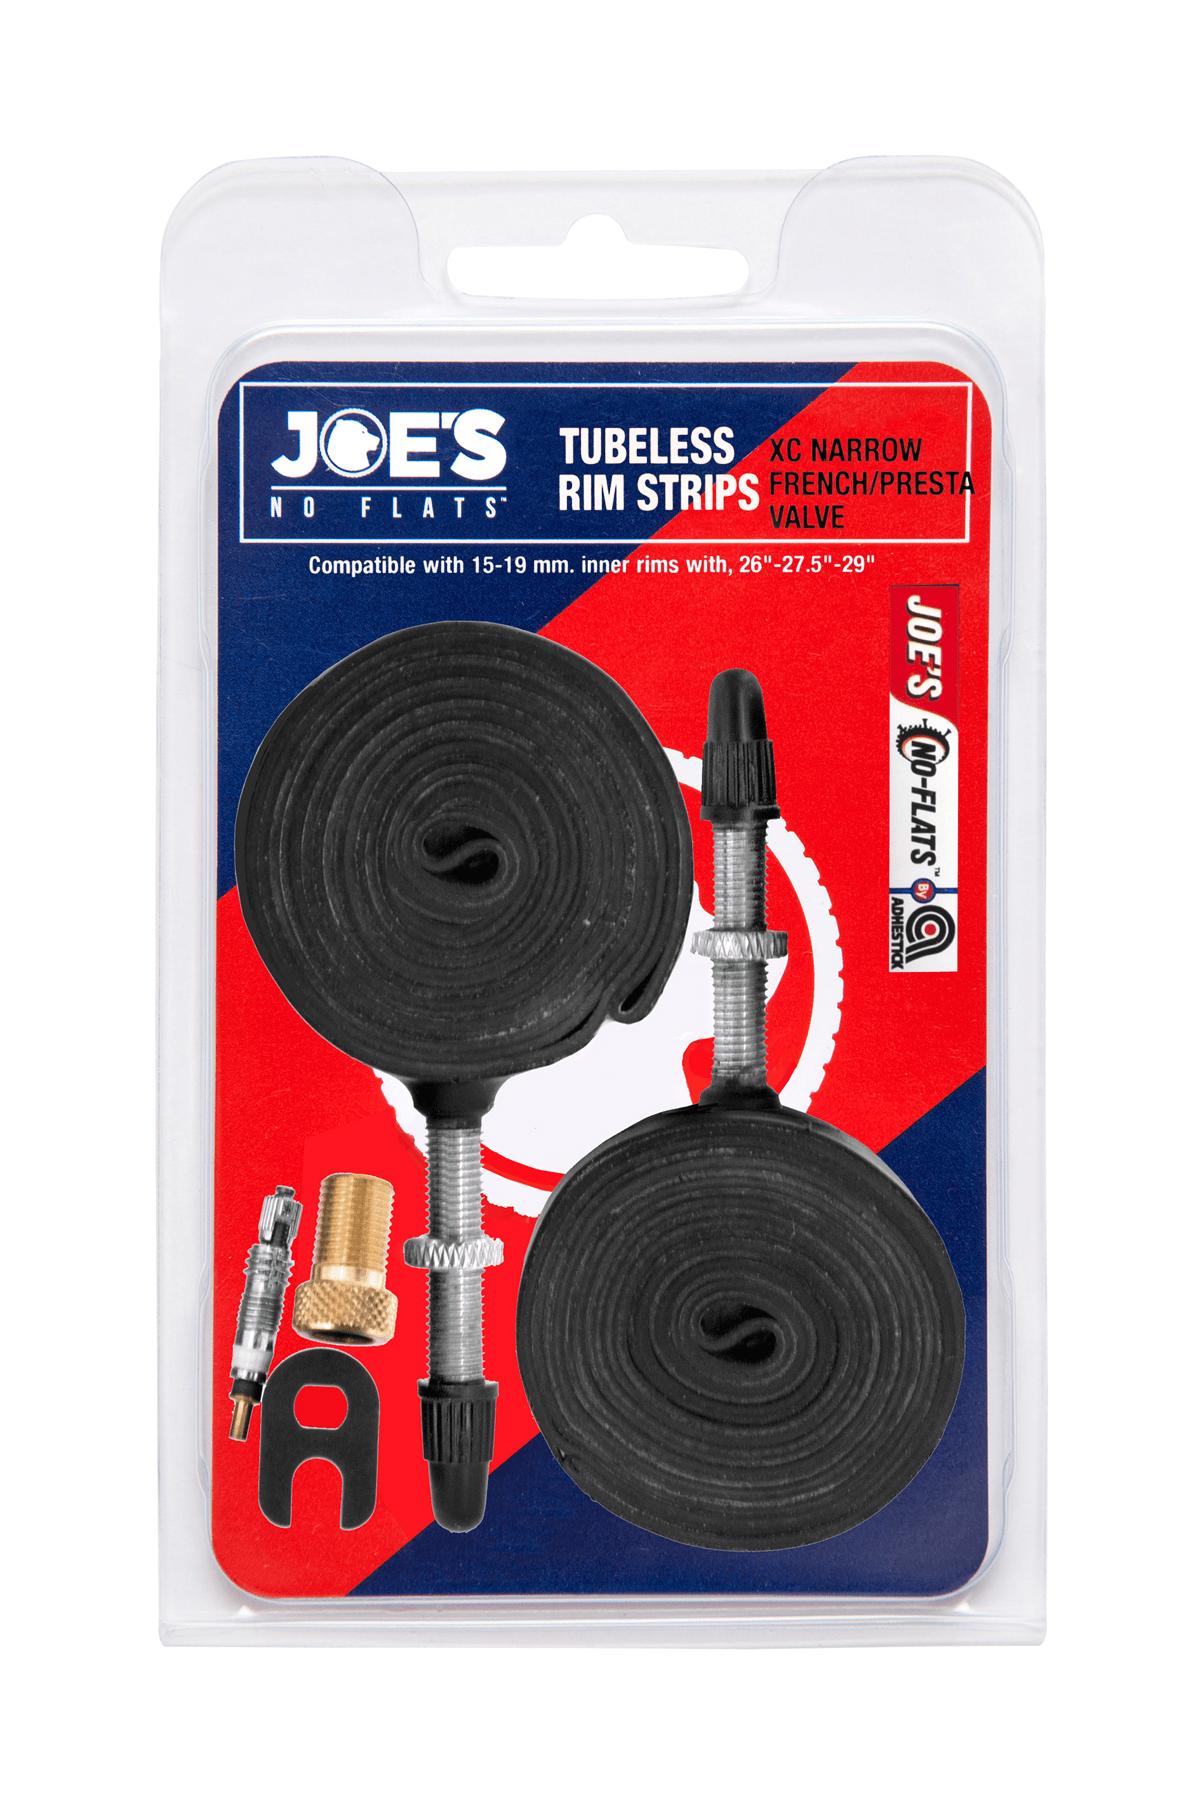 Joe's No Flats Tubeless Rim Strips XC Narrow   Rims